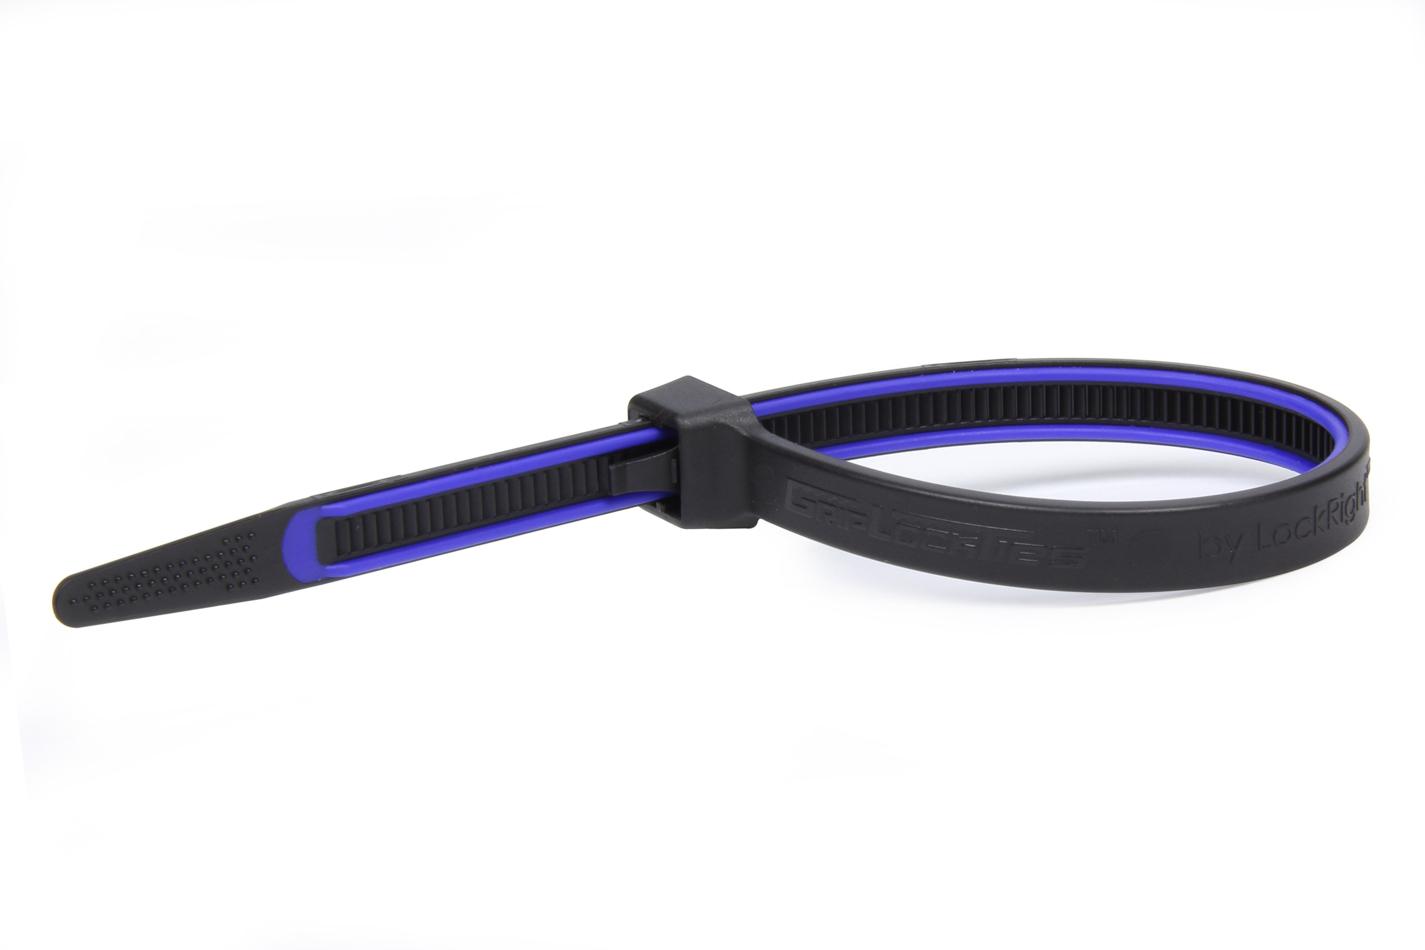 Grip Lock Ties 2912BKBUHB15 Cable Ties, Zip Ties, 12 in Long, Blue Rubber Lined, Nylon, Black, Reusable, Set of 15